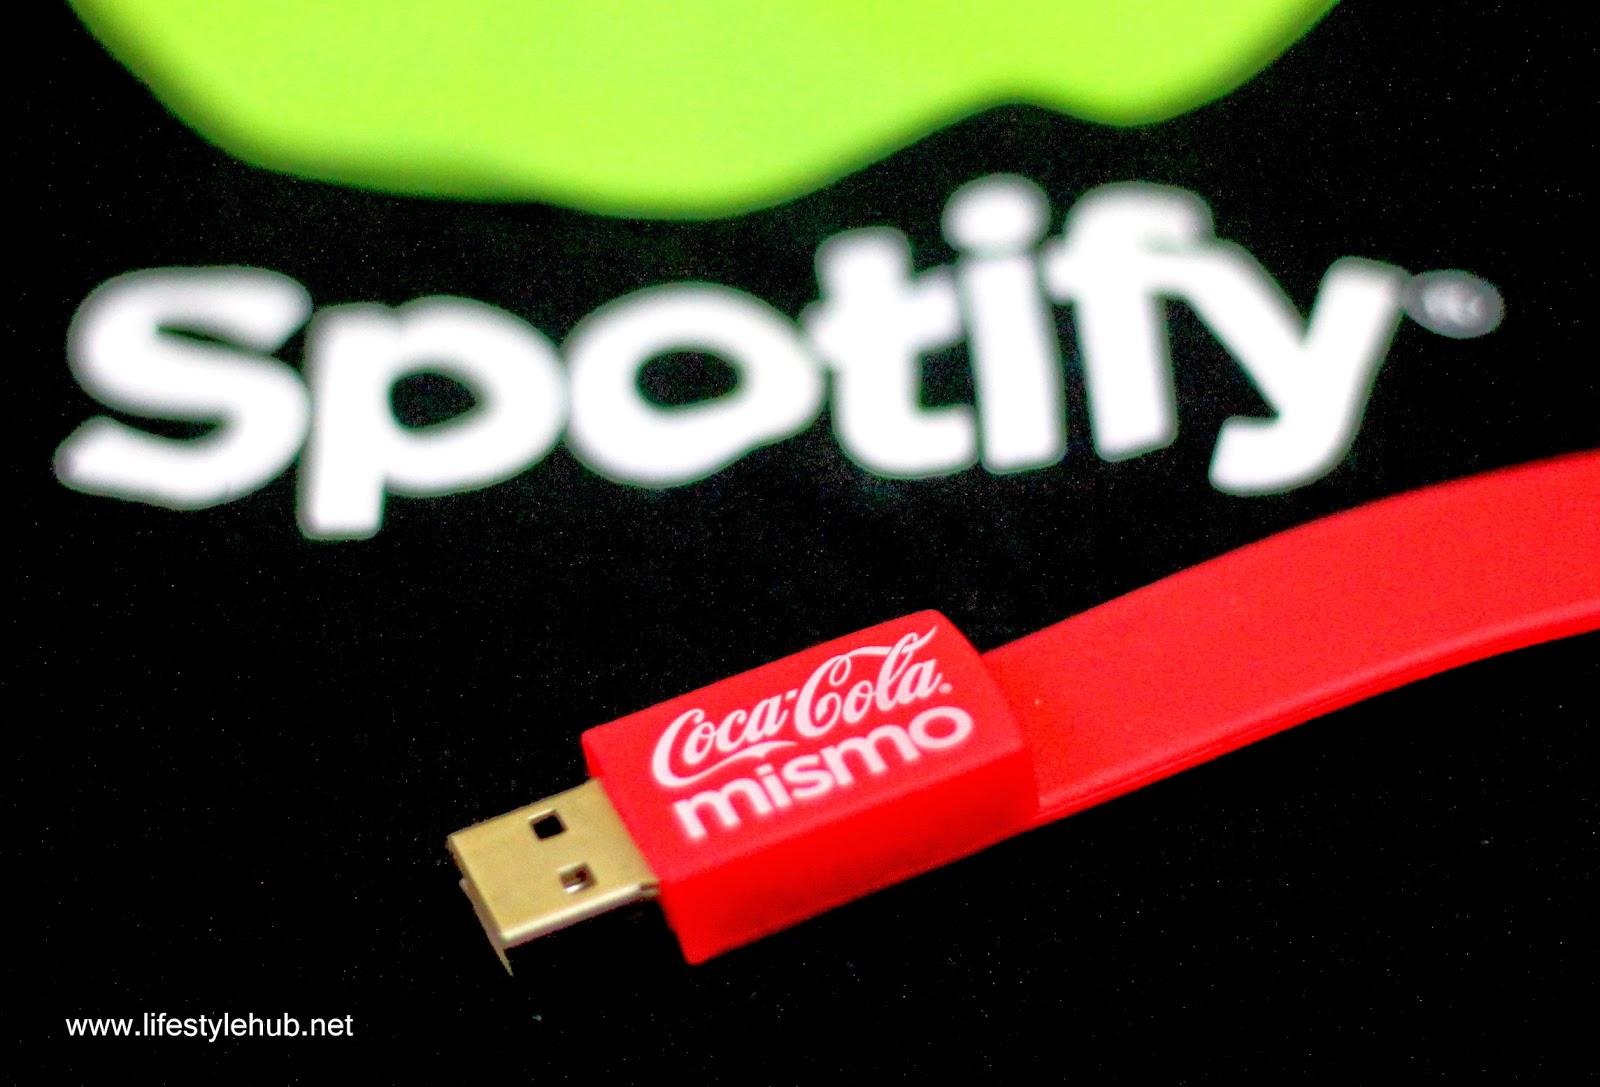 coca-cola and spotify